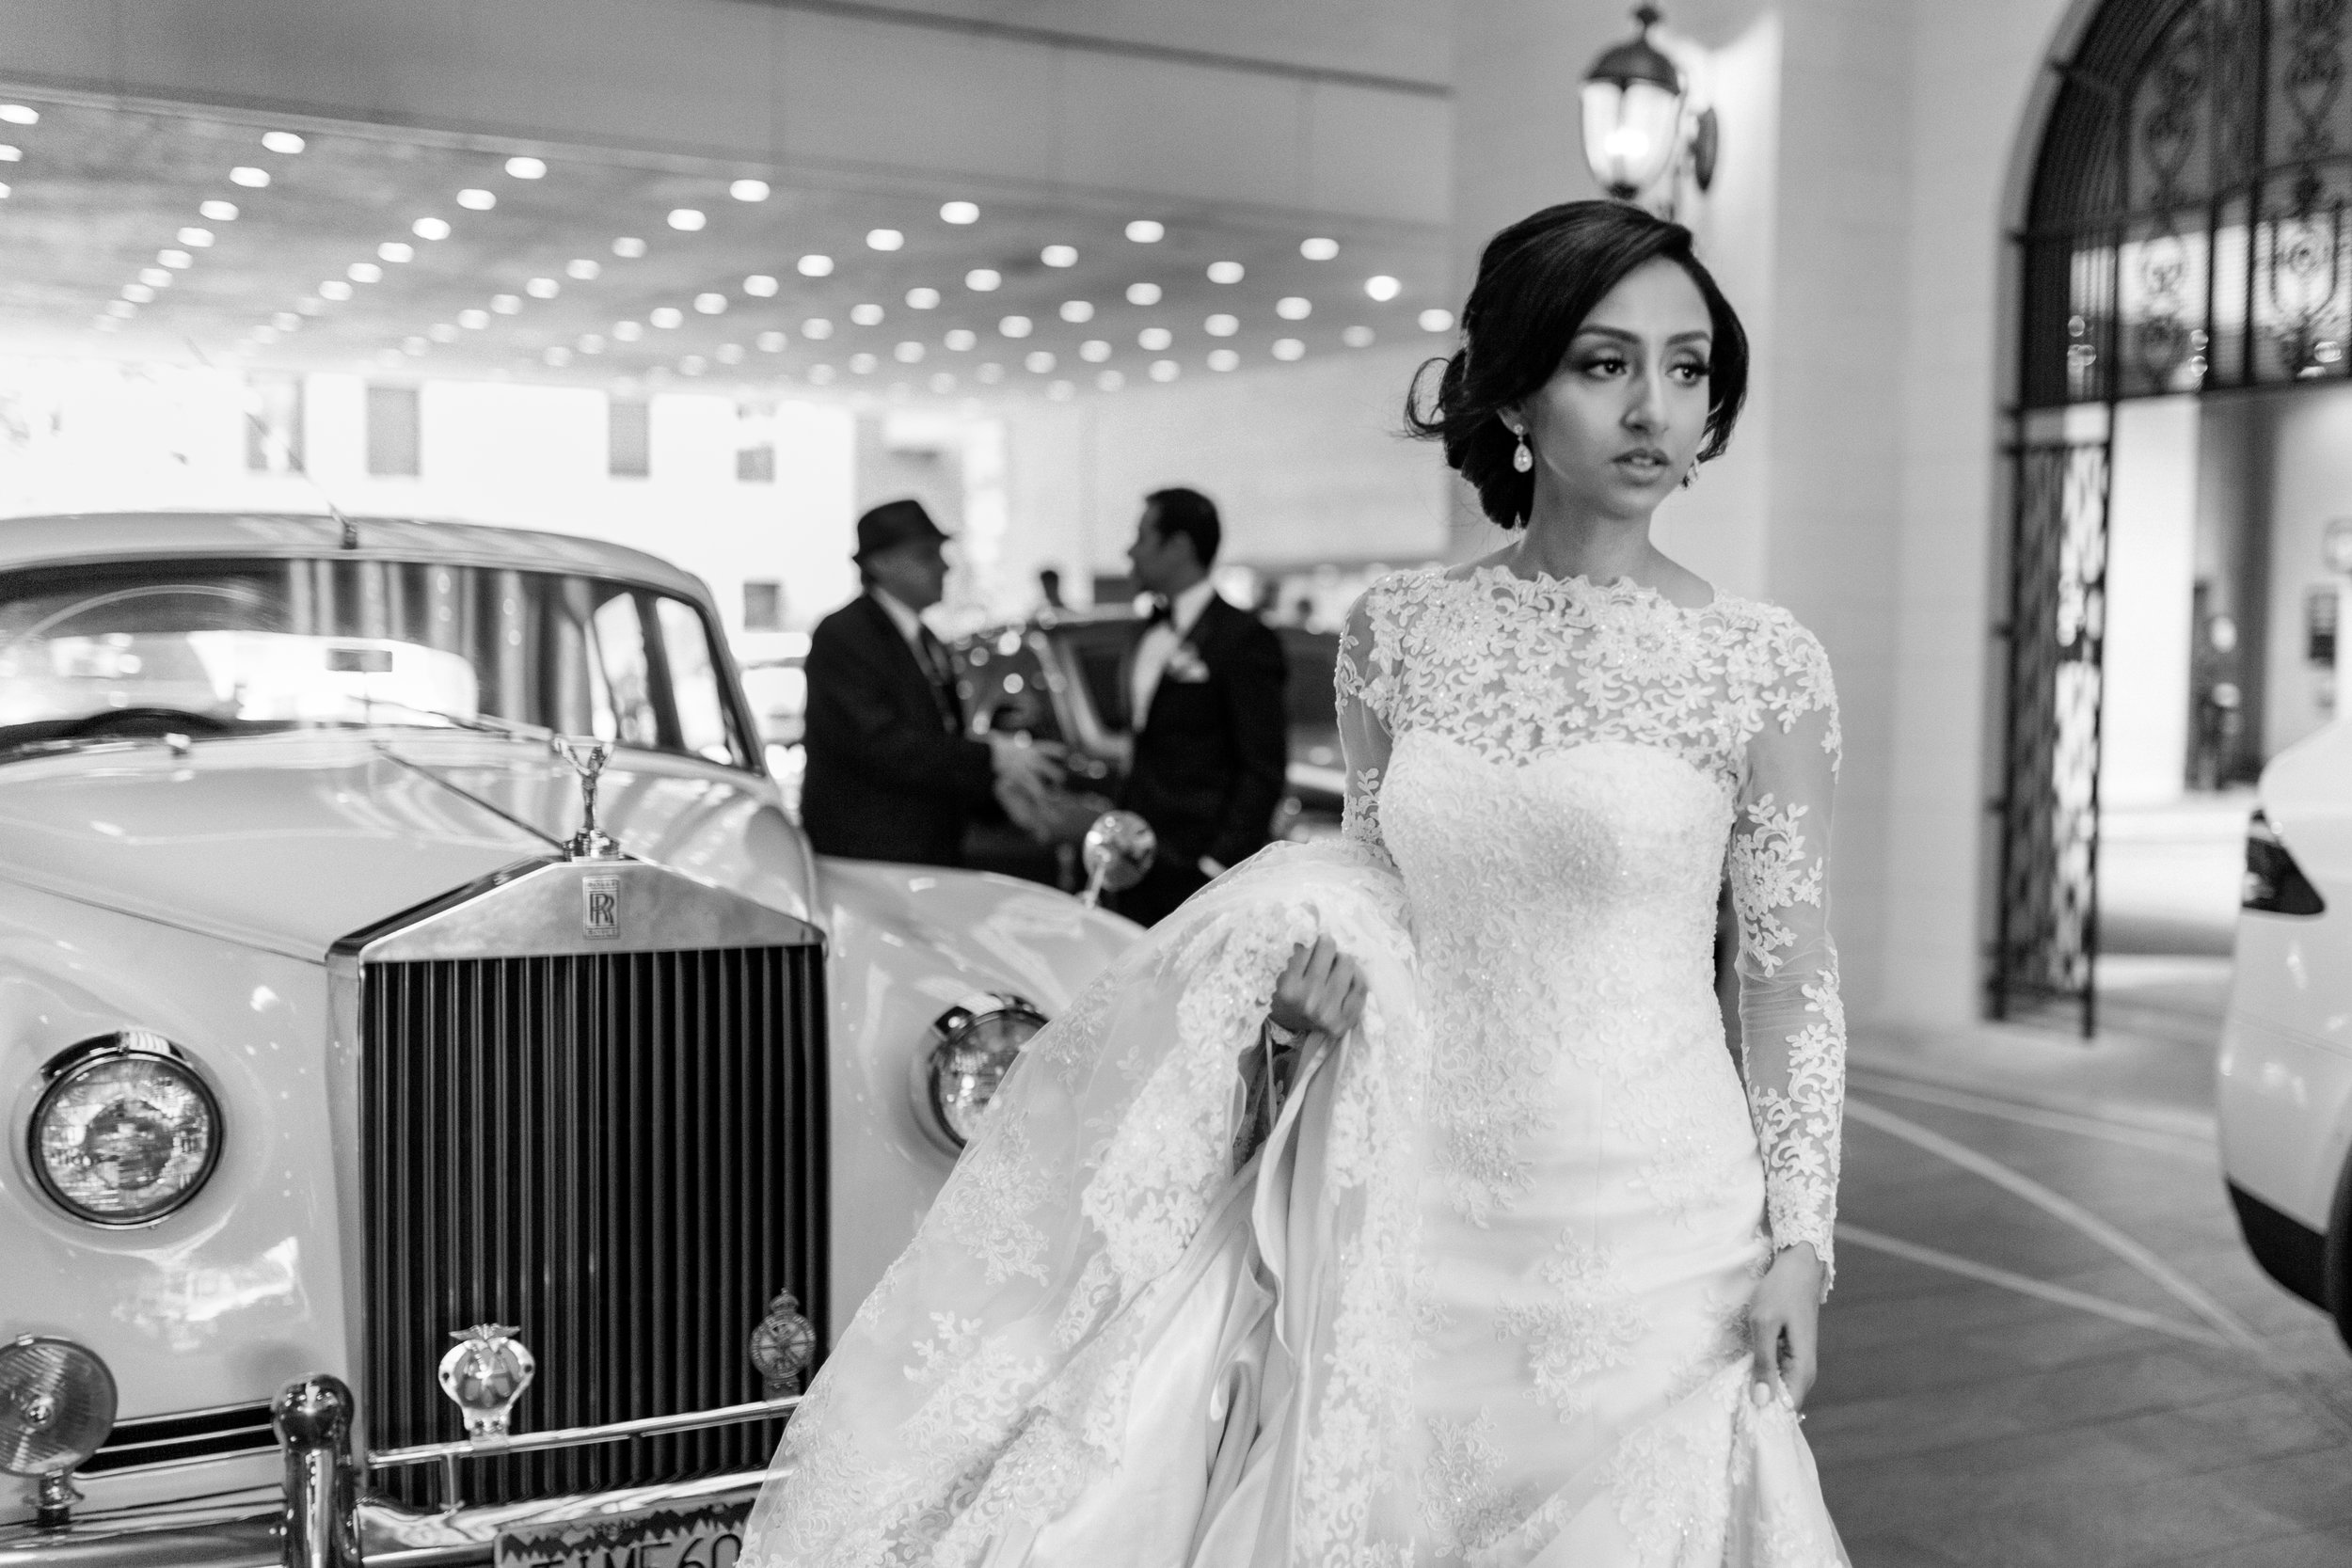 herafilms_wedding_shima_jose_hera_selects-32.jpg